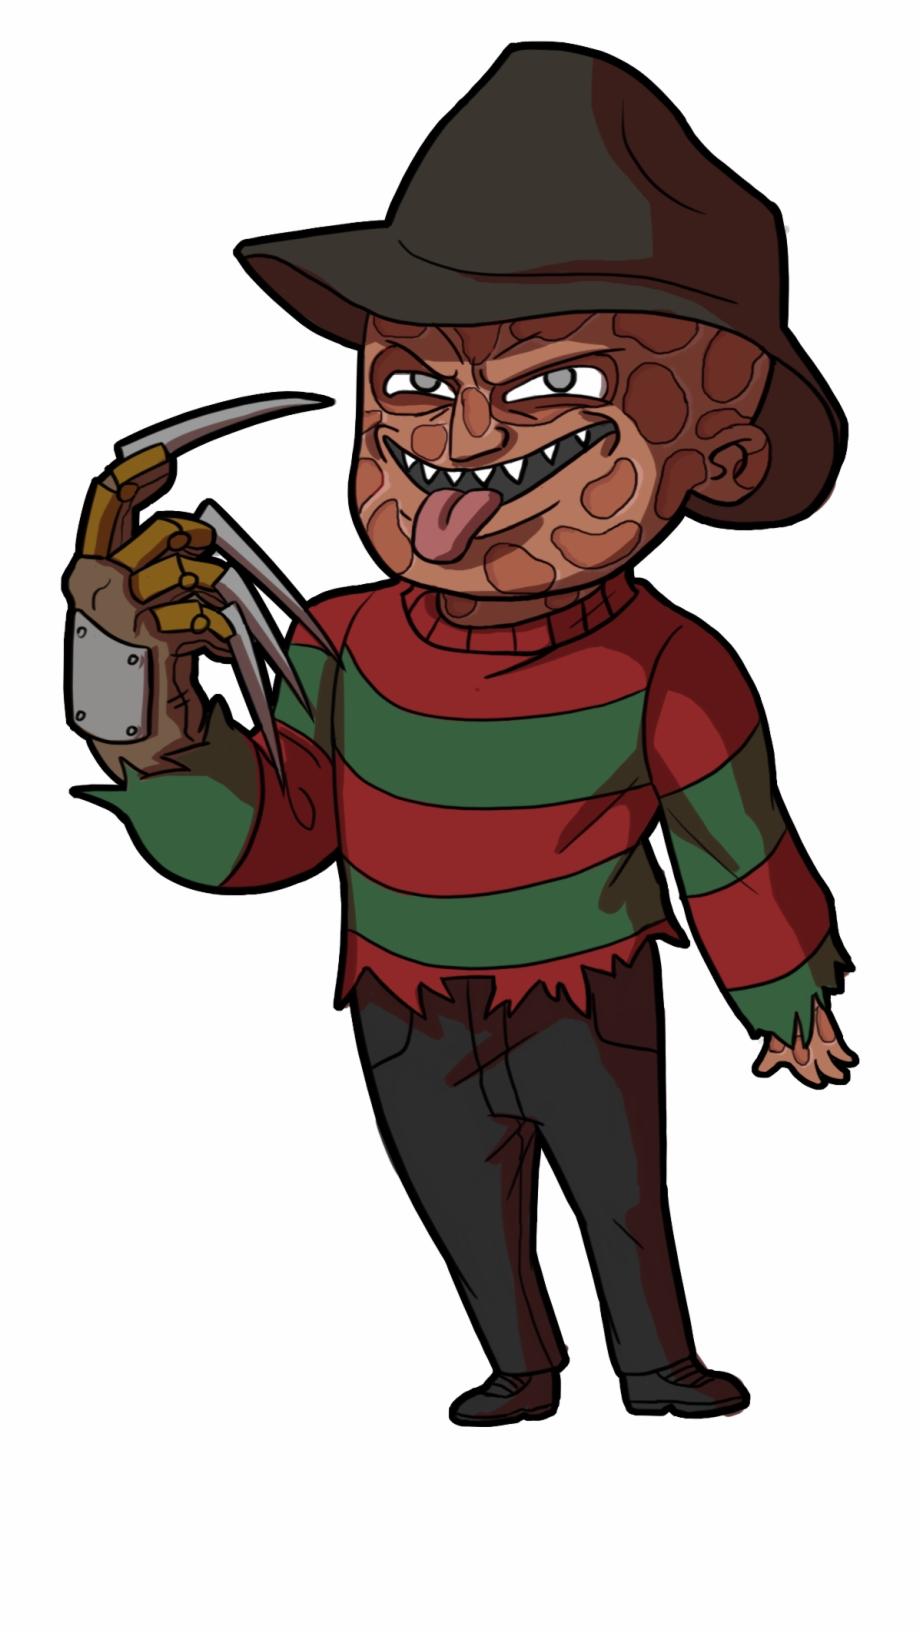 Freddy kruger clipart. Dead by daylight jason